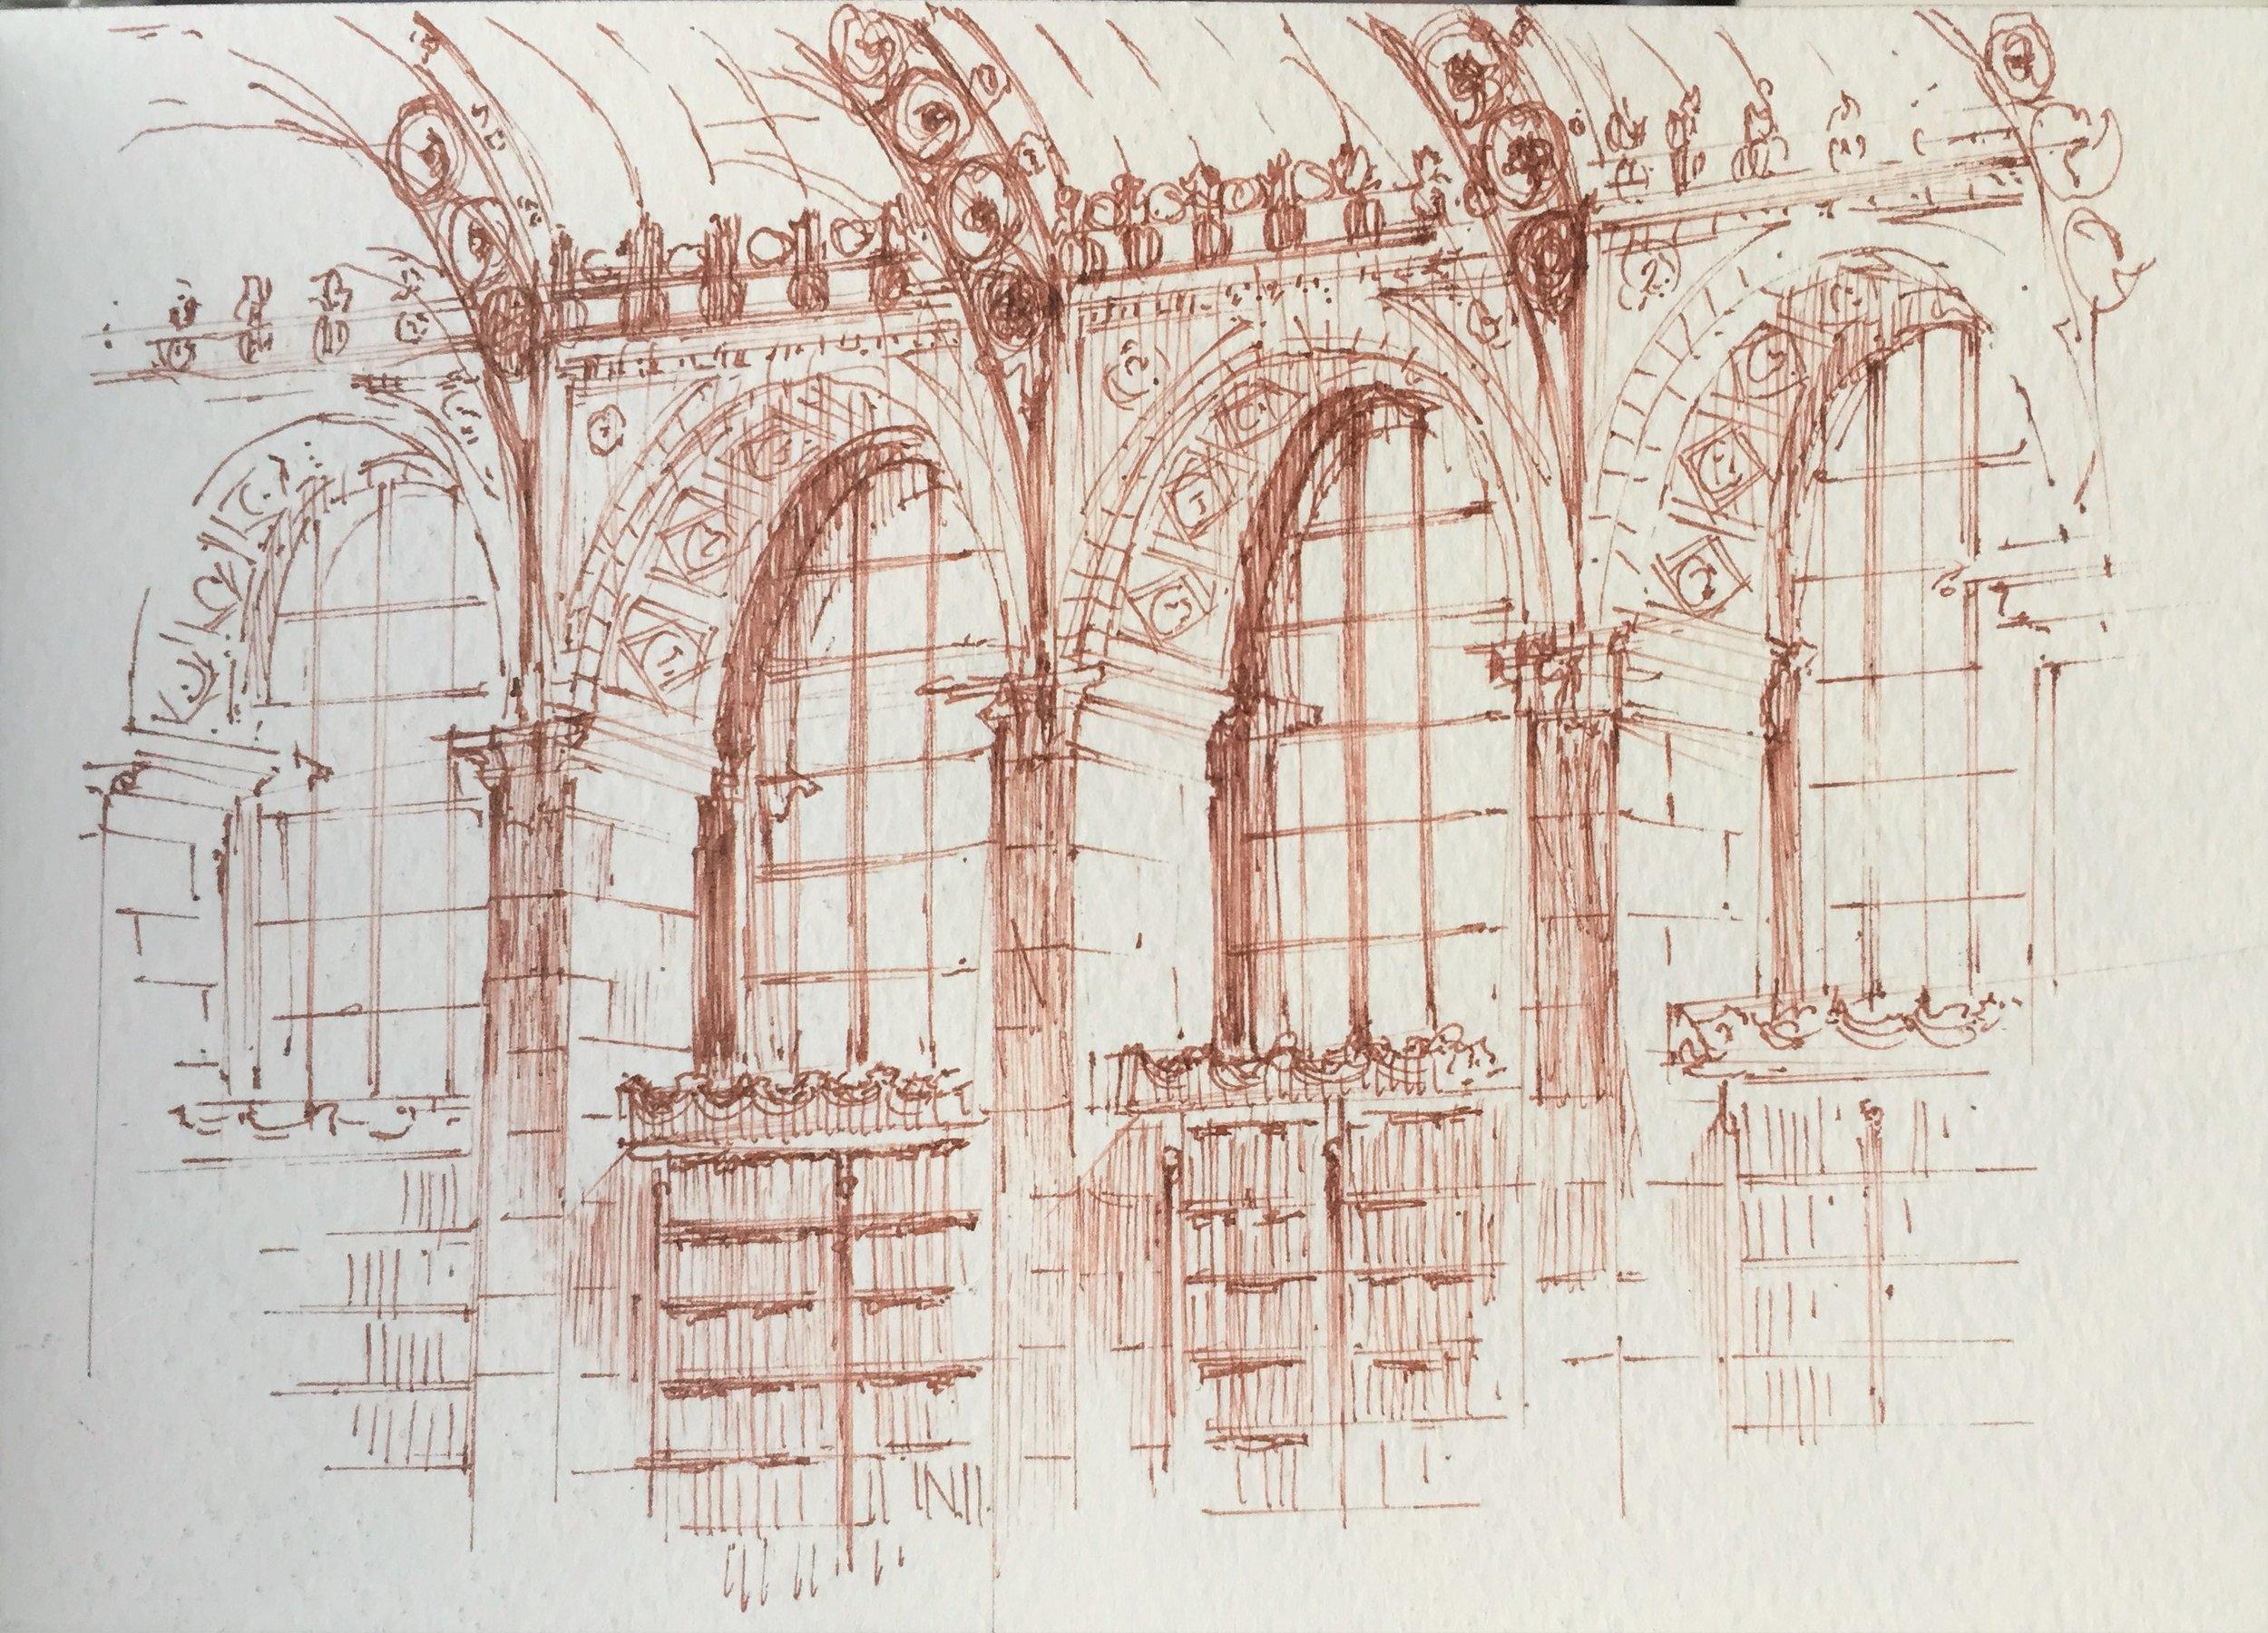 "Sketch - Leslie-jon Vickory of Hamady Architects ""Bibliotheque Sainte Genevieve #2"""